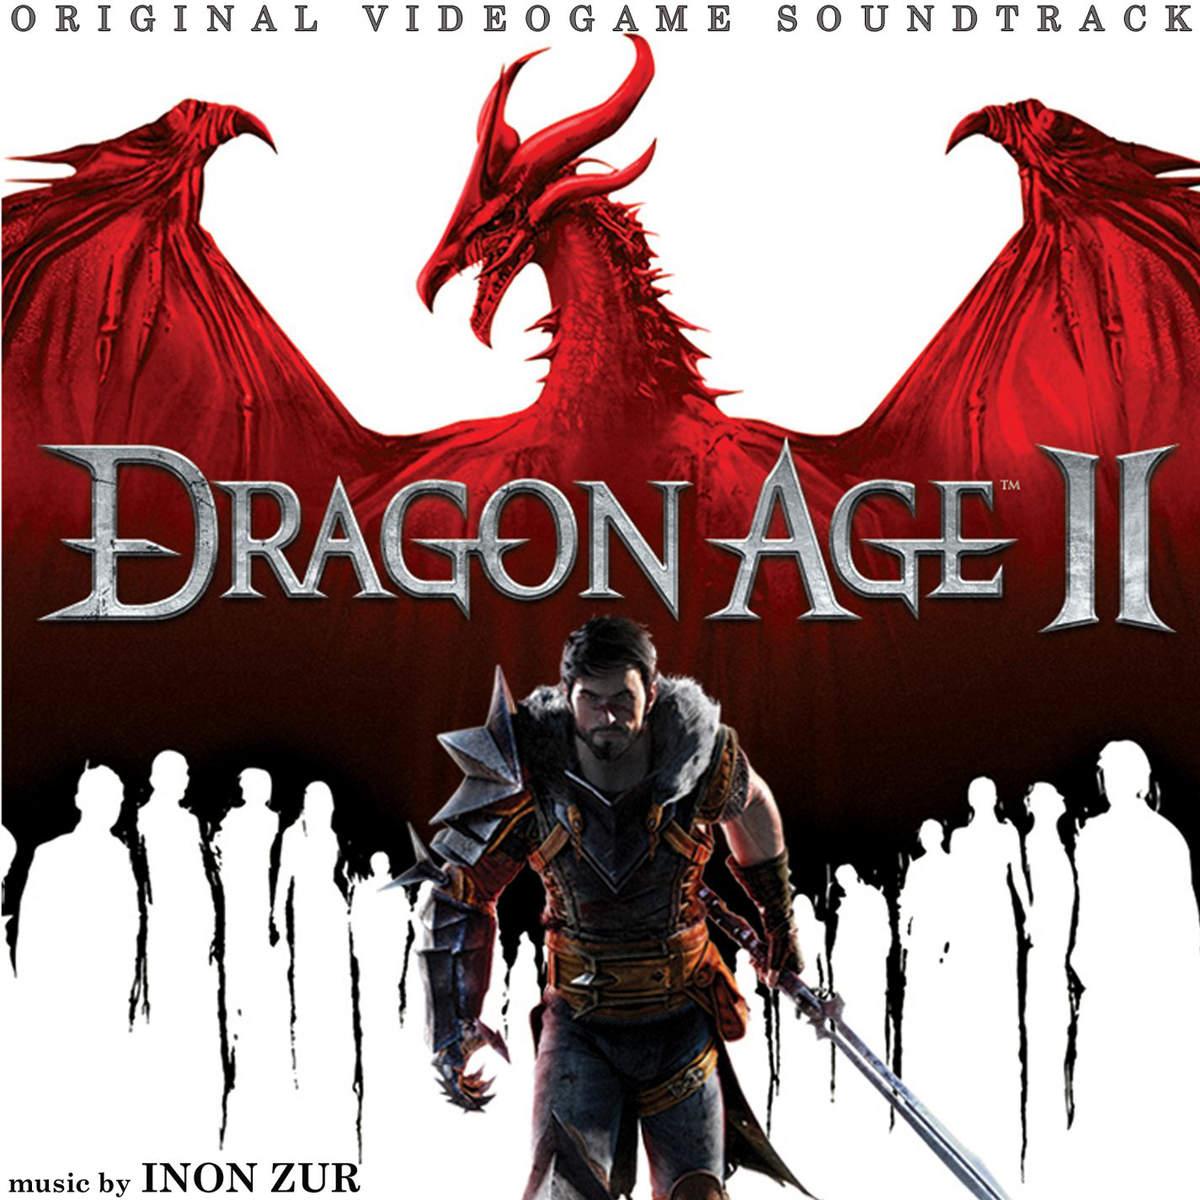 Dragon_Age_2_Original_Videogame_Soundtrack__cover1200x1200.jpg